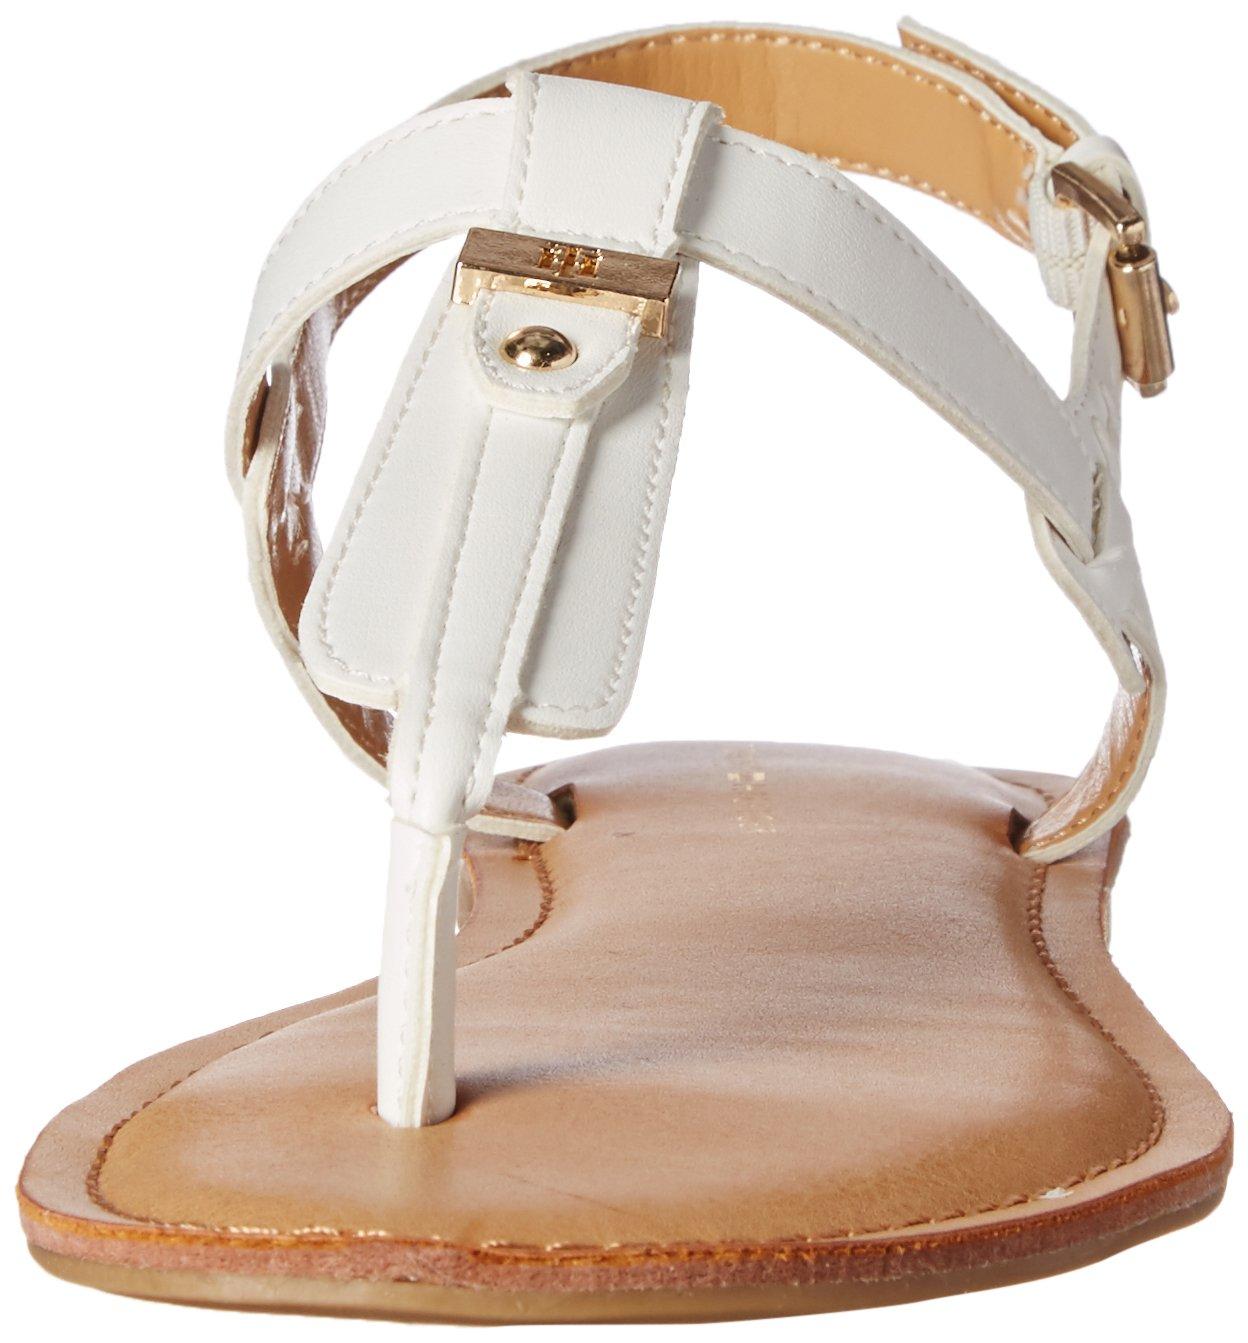 Tommy Hilfiger Women's Landmark Flat Sandal B01MA6IWUW 6.5 B(M) US|White